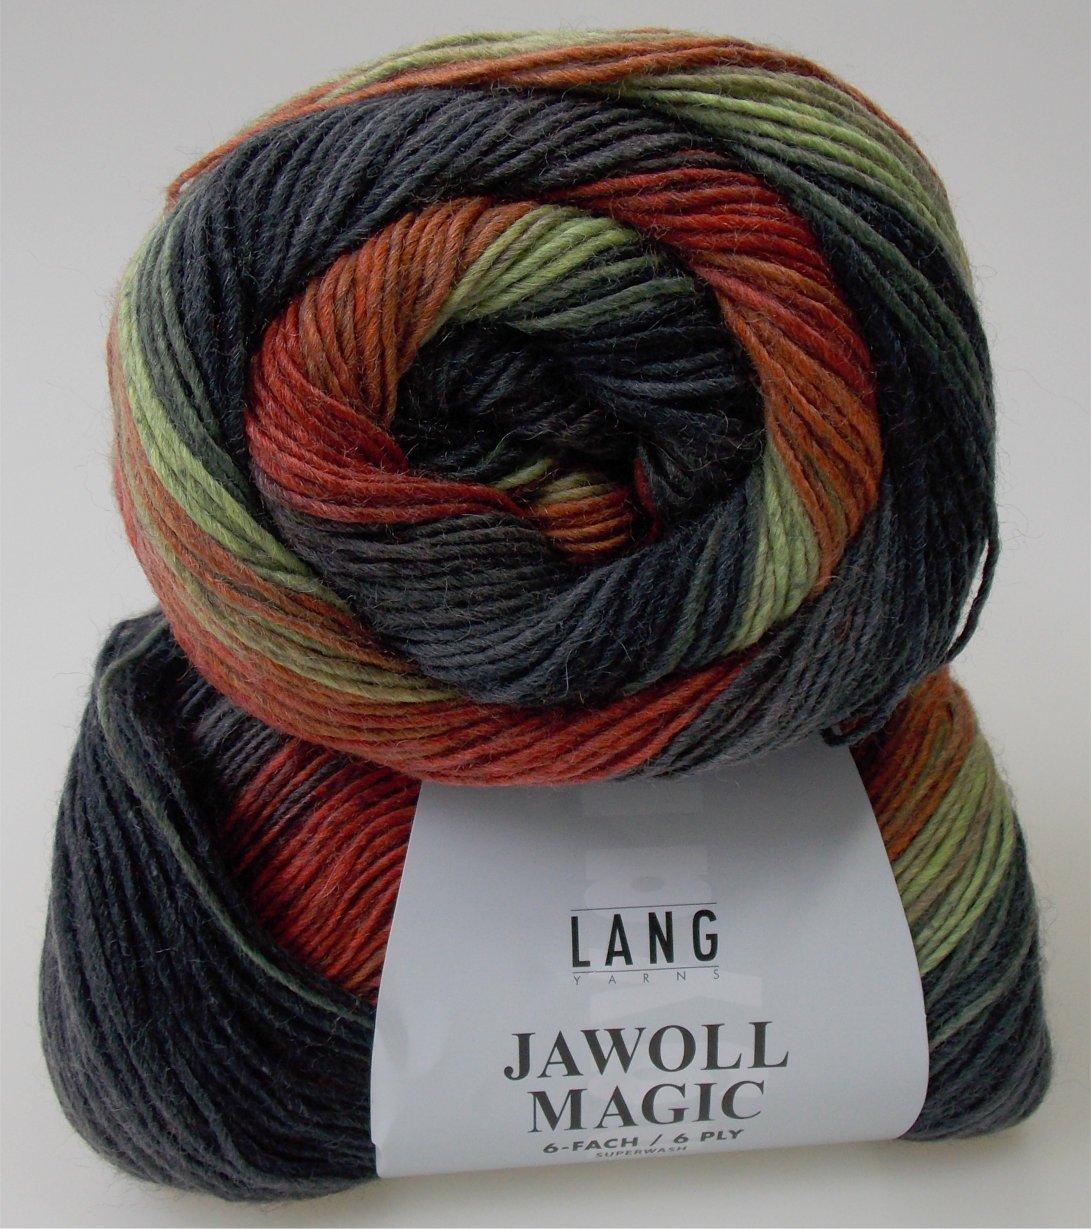 150 g Jawoll Magic 6-fädig Sockenwolle, Fb. 0087 - neue Farbe 2015 ...